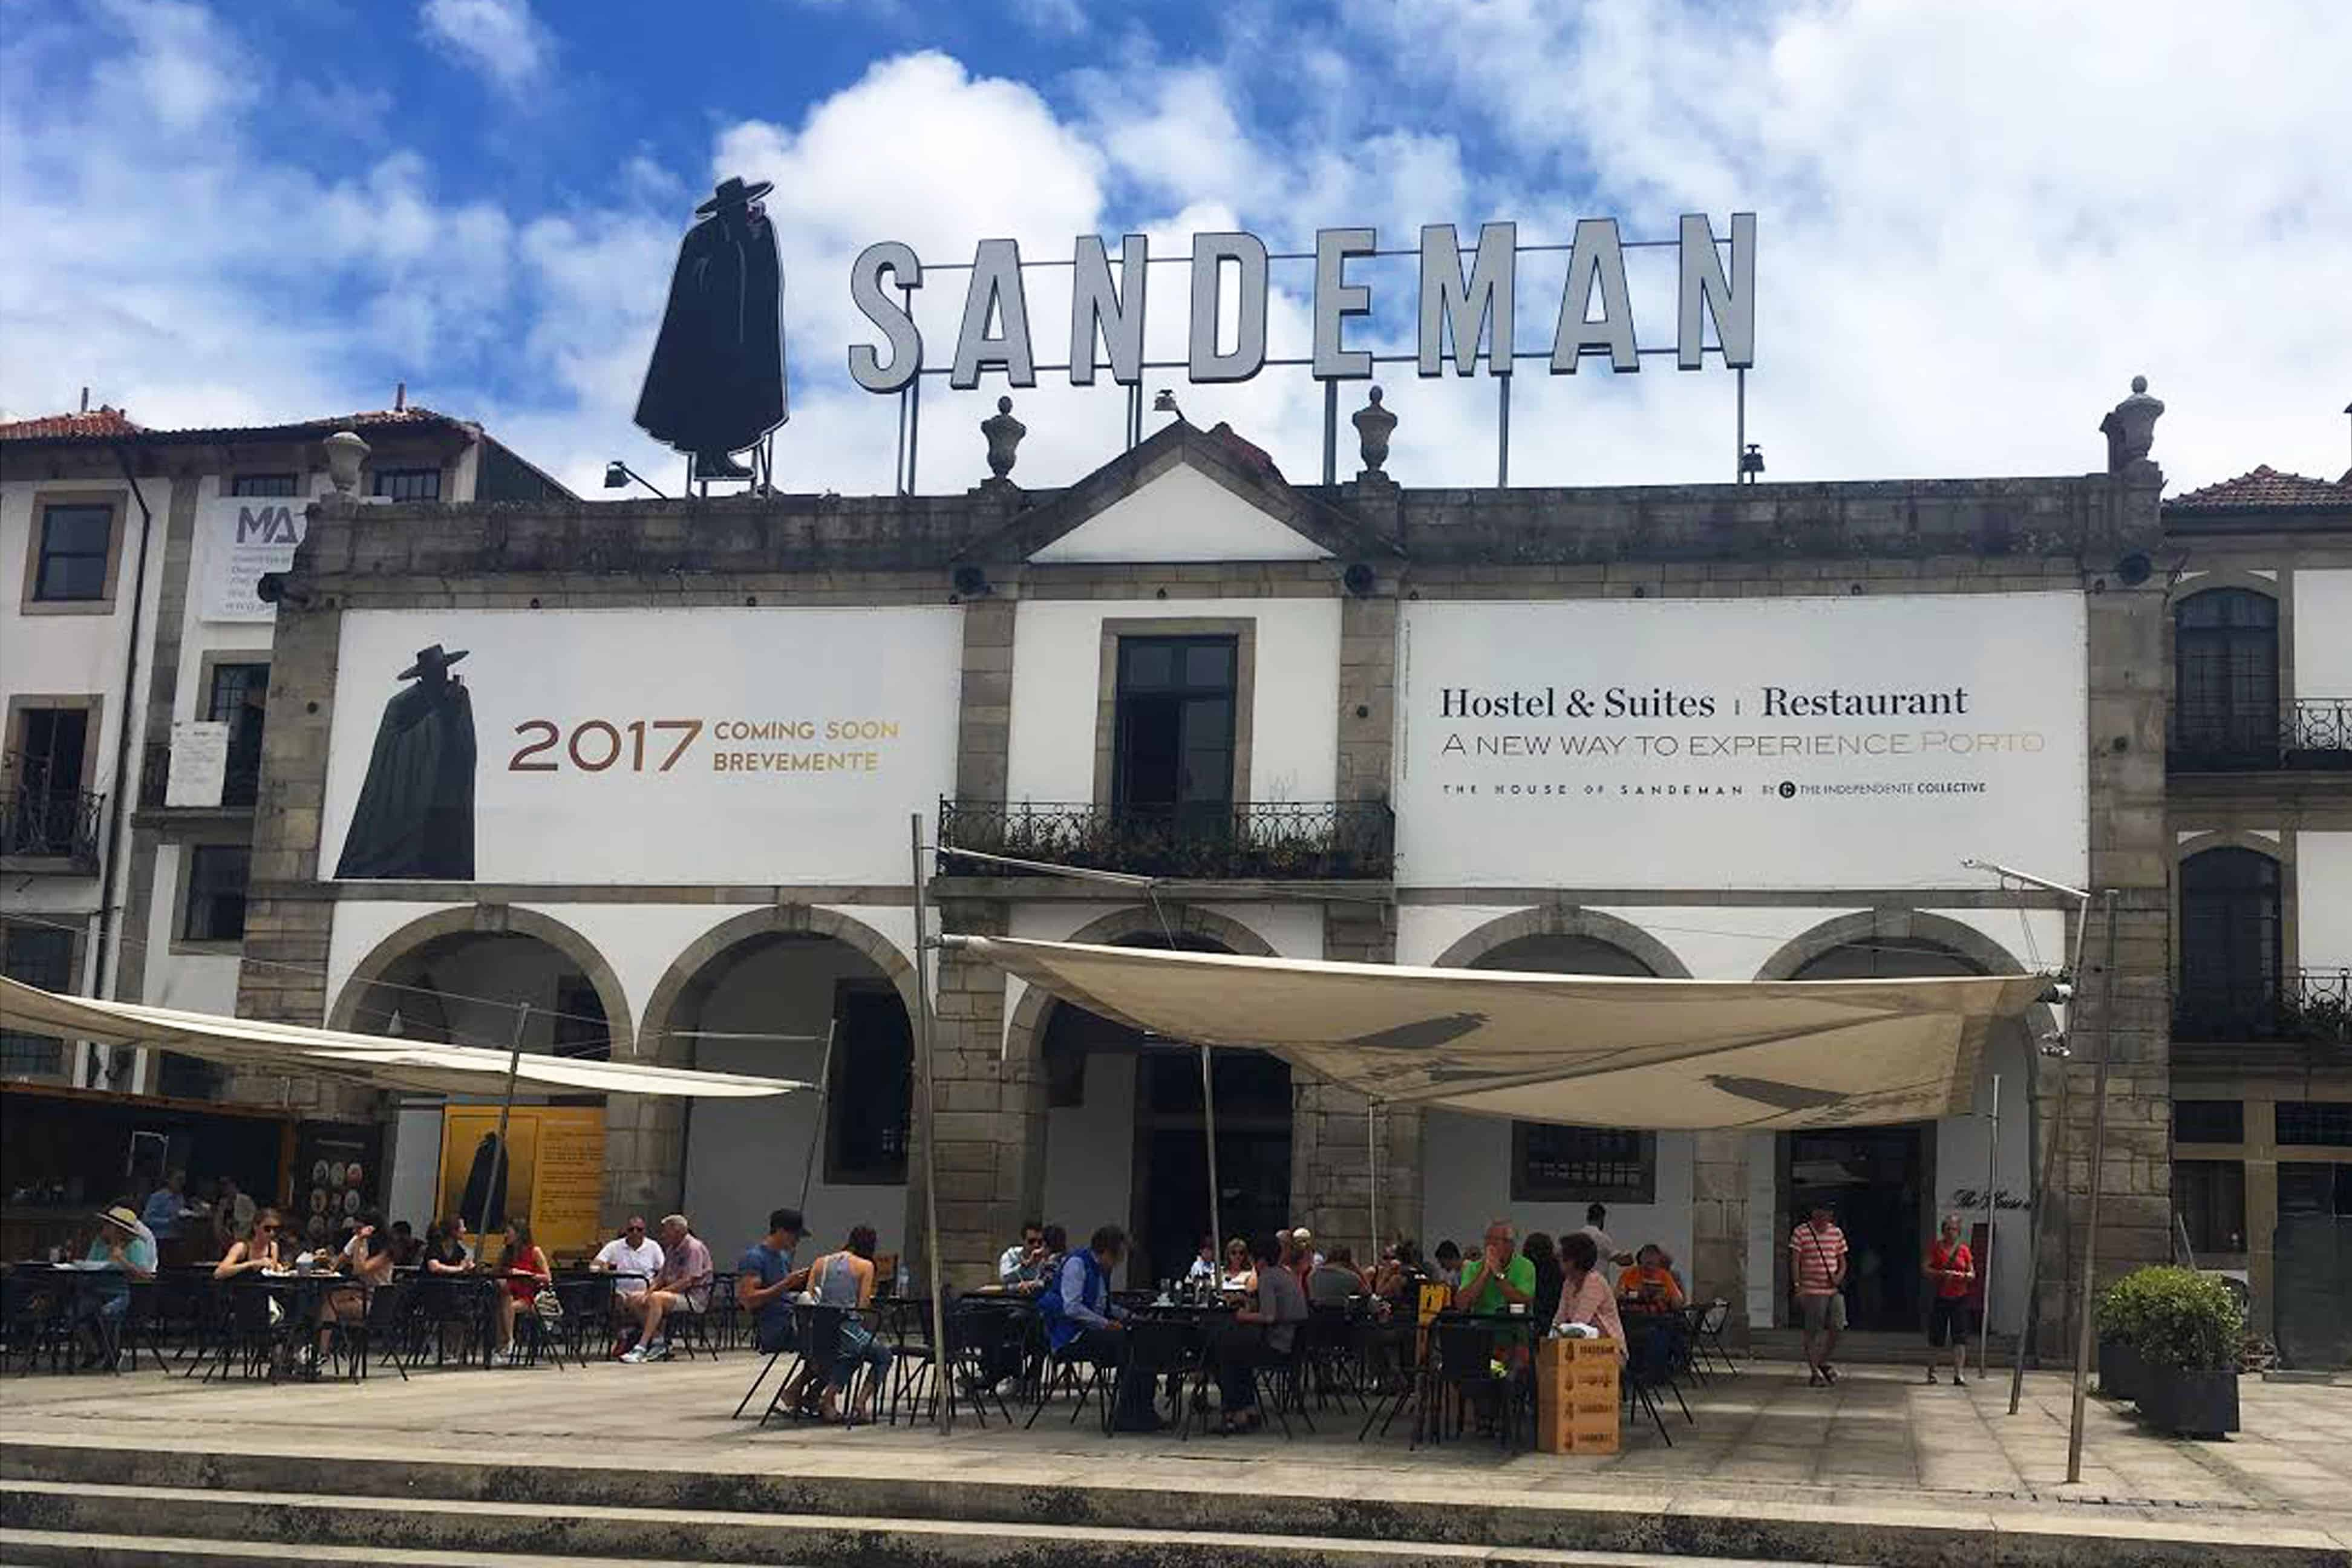 House of Sandeman Port wine cellar